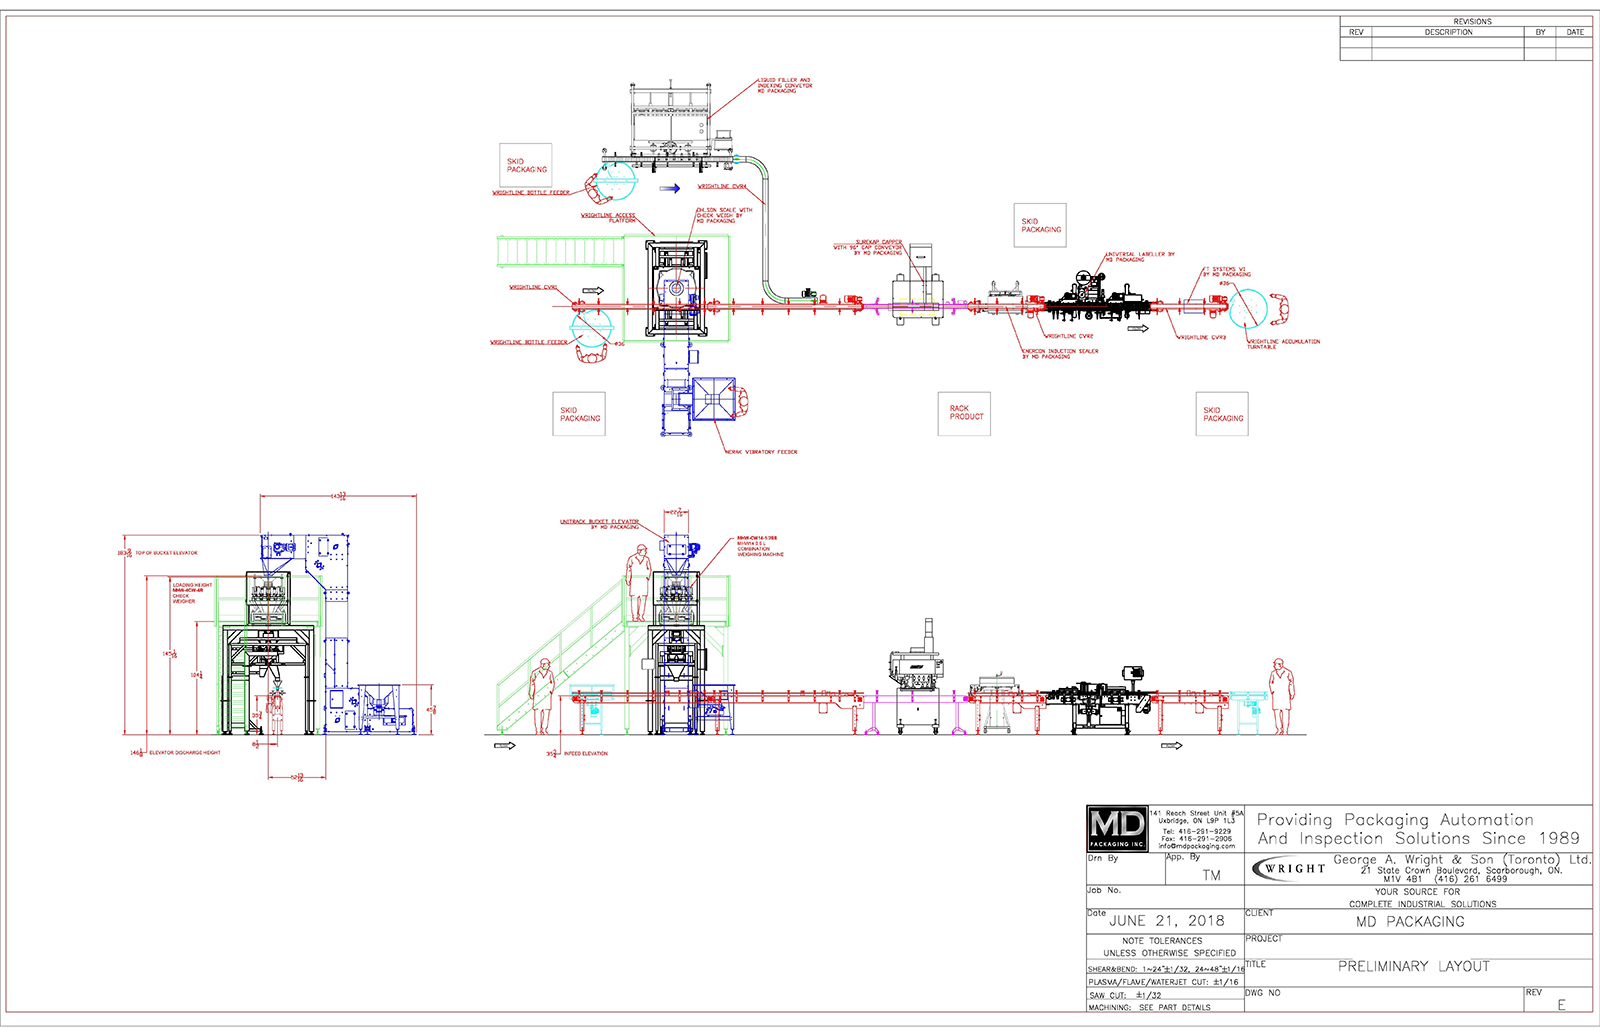 resized180621delta-9-packaging-layout-reve-dsize